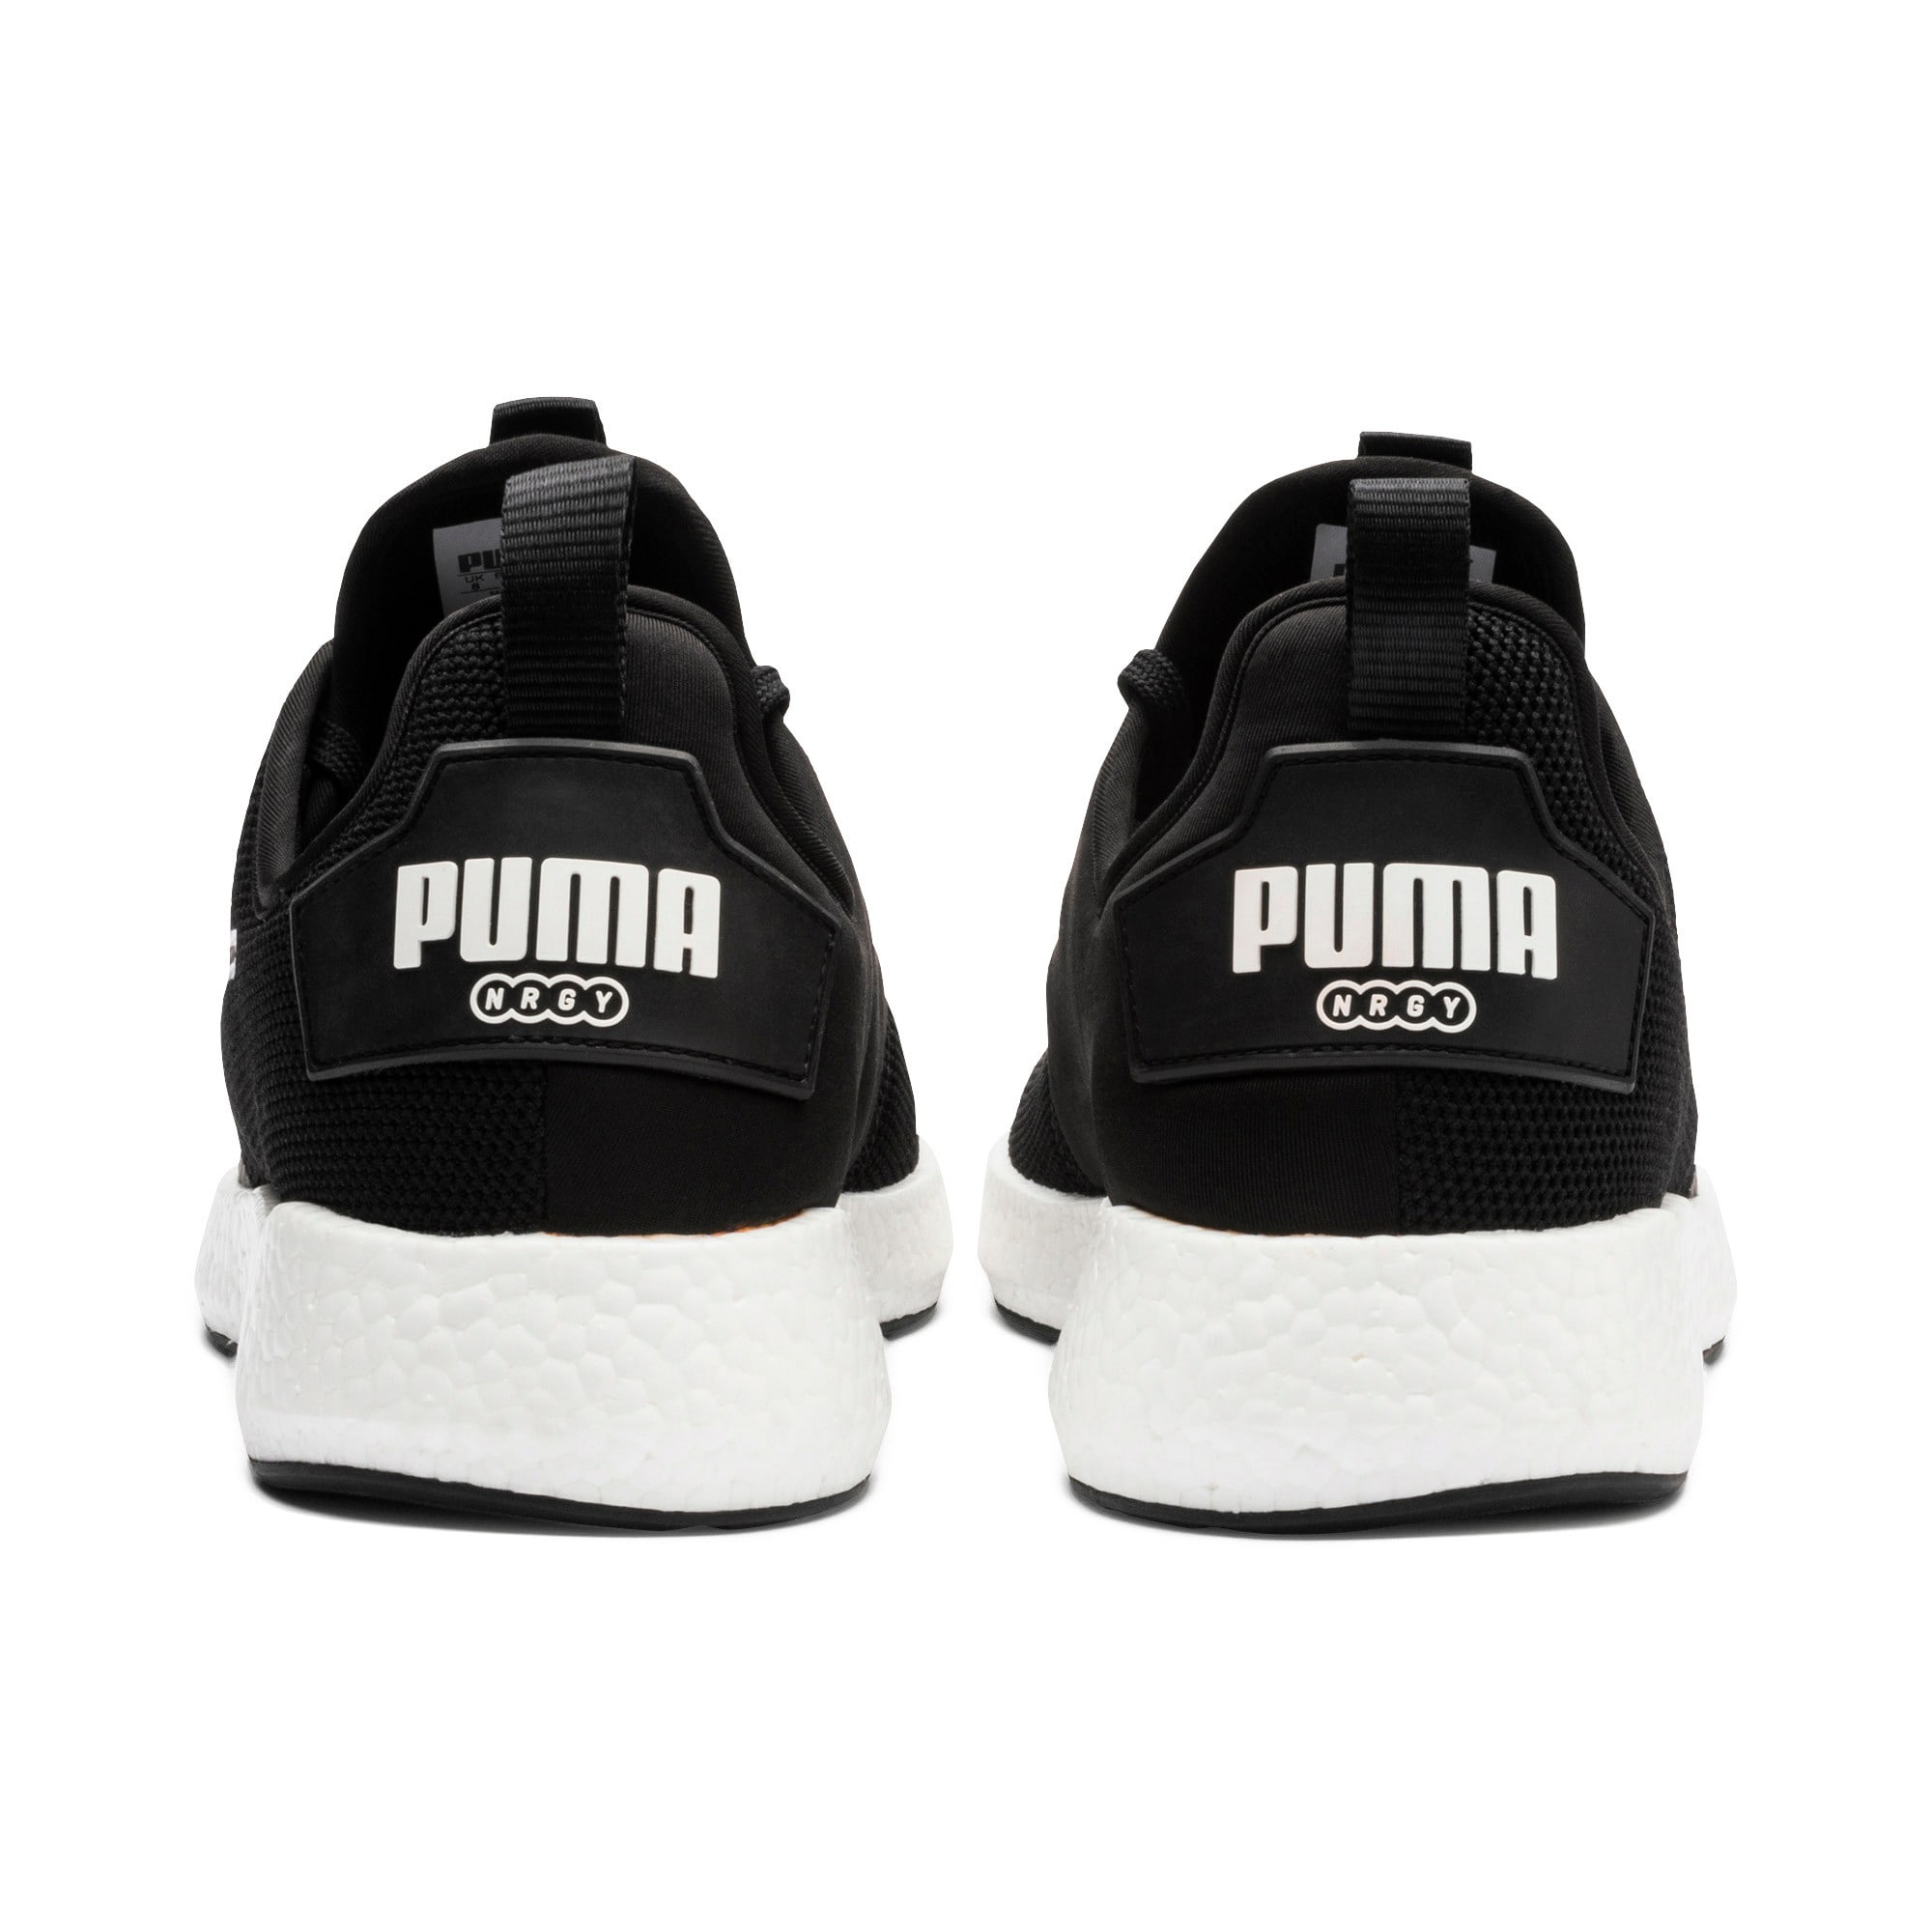 Thumbnail 3 of NRGY Neko Men's Running Shoes, Puma Black-Puma White, medium